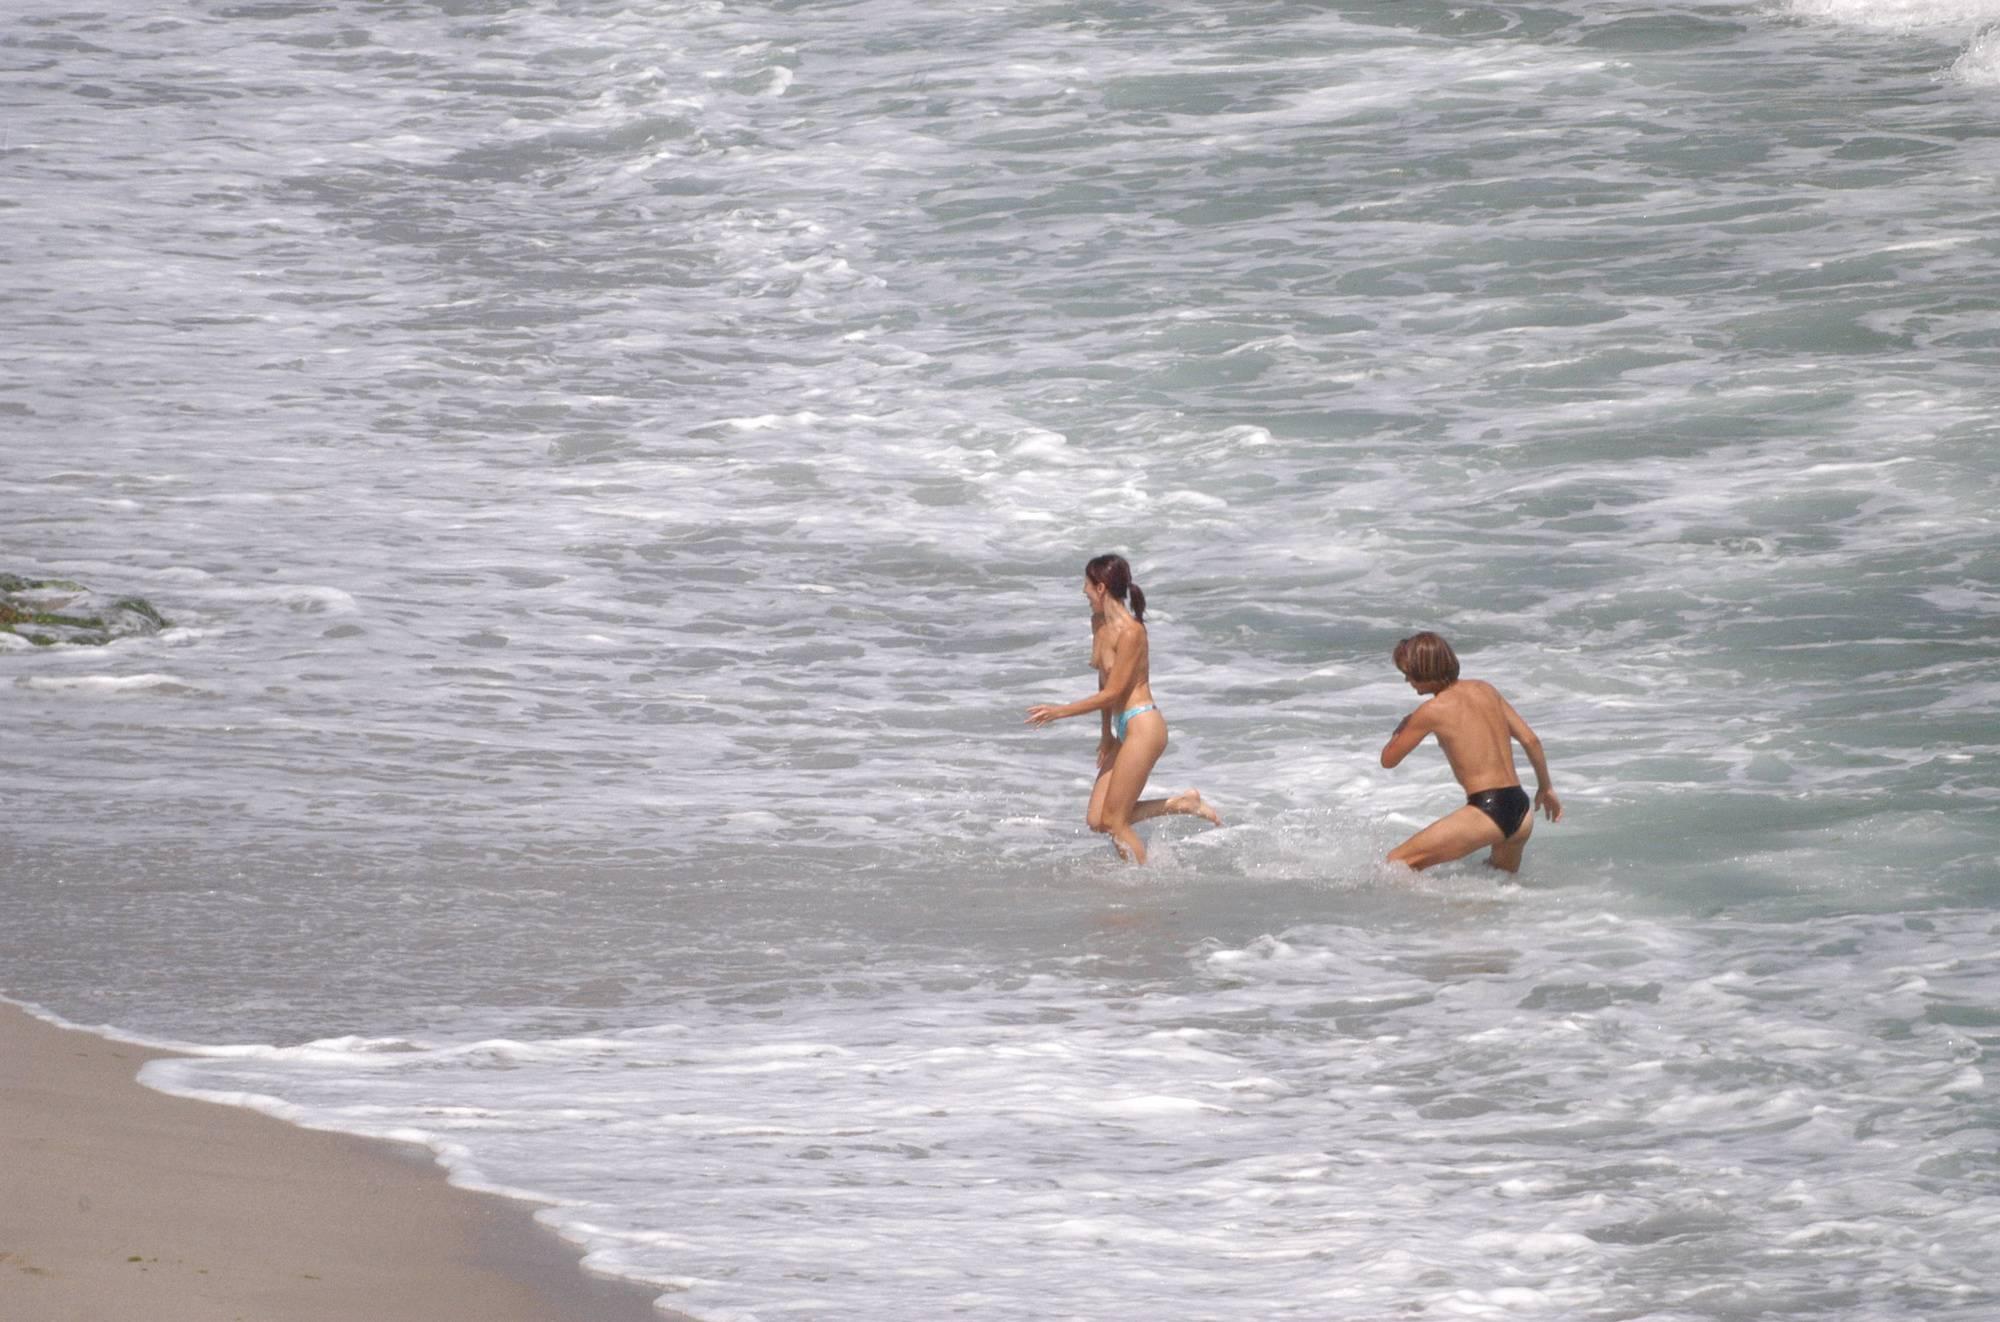 Purenudism Images Verna Beach Far Overview - 1